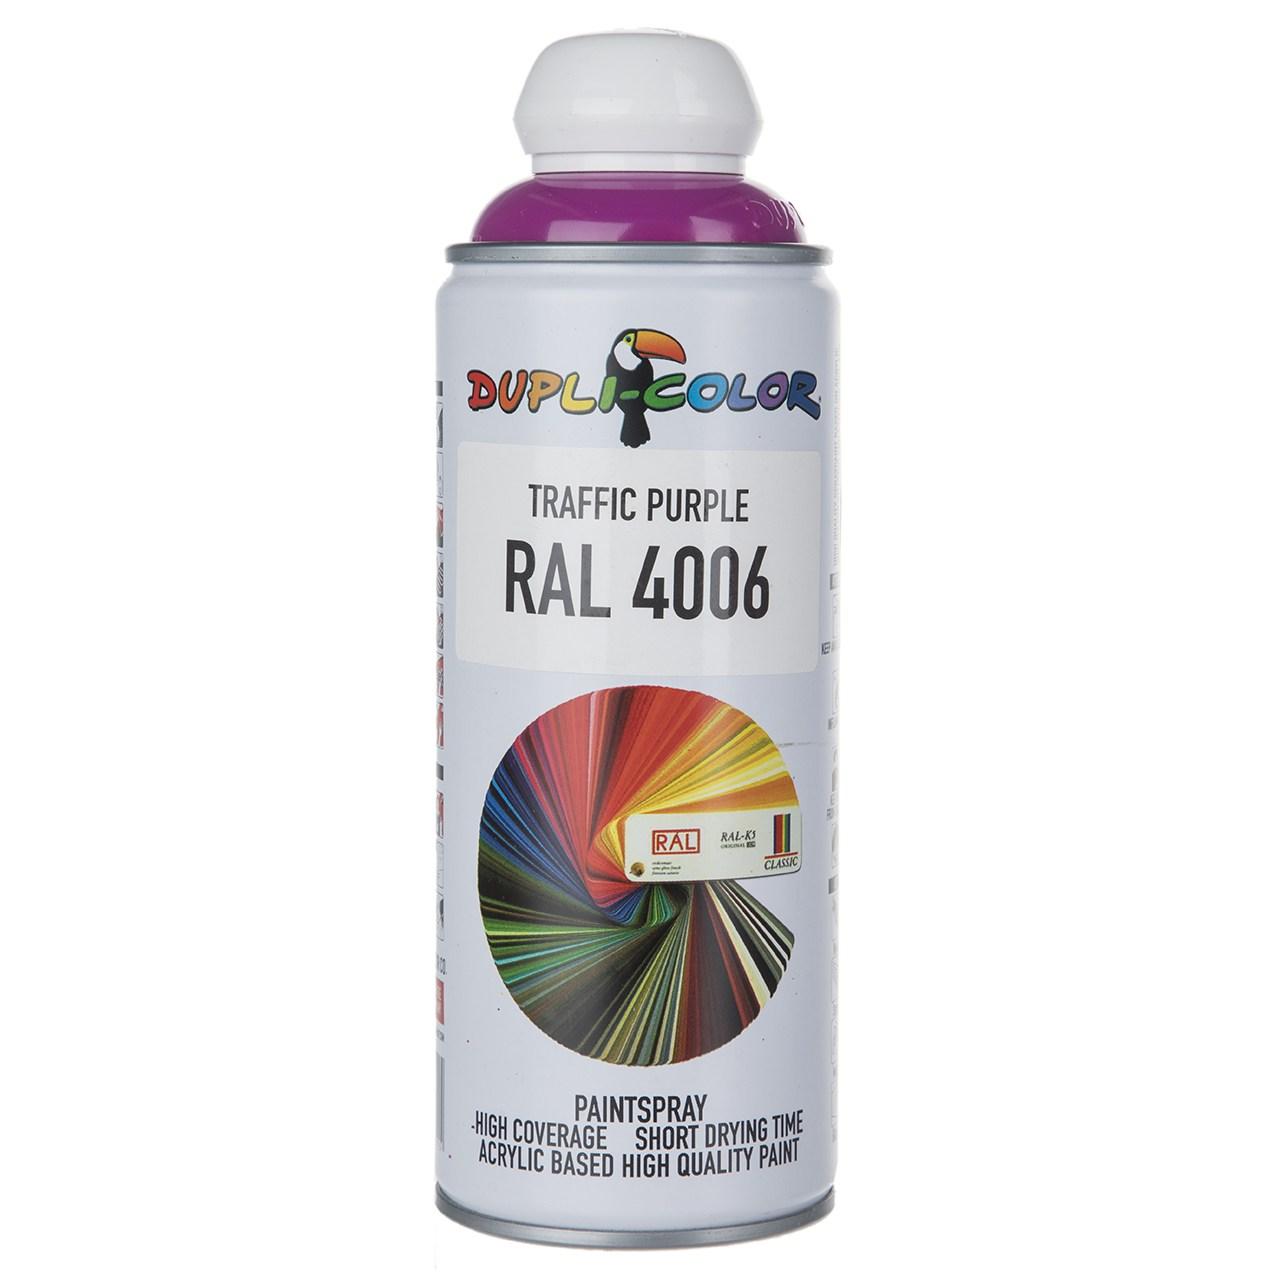 اسپری رنگ بنفش دوپلی کالر مدل RAL 4006 حجم 400 میلی لیتر